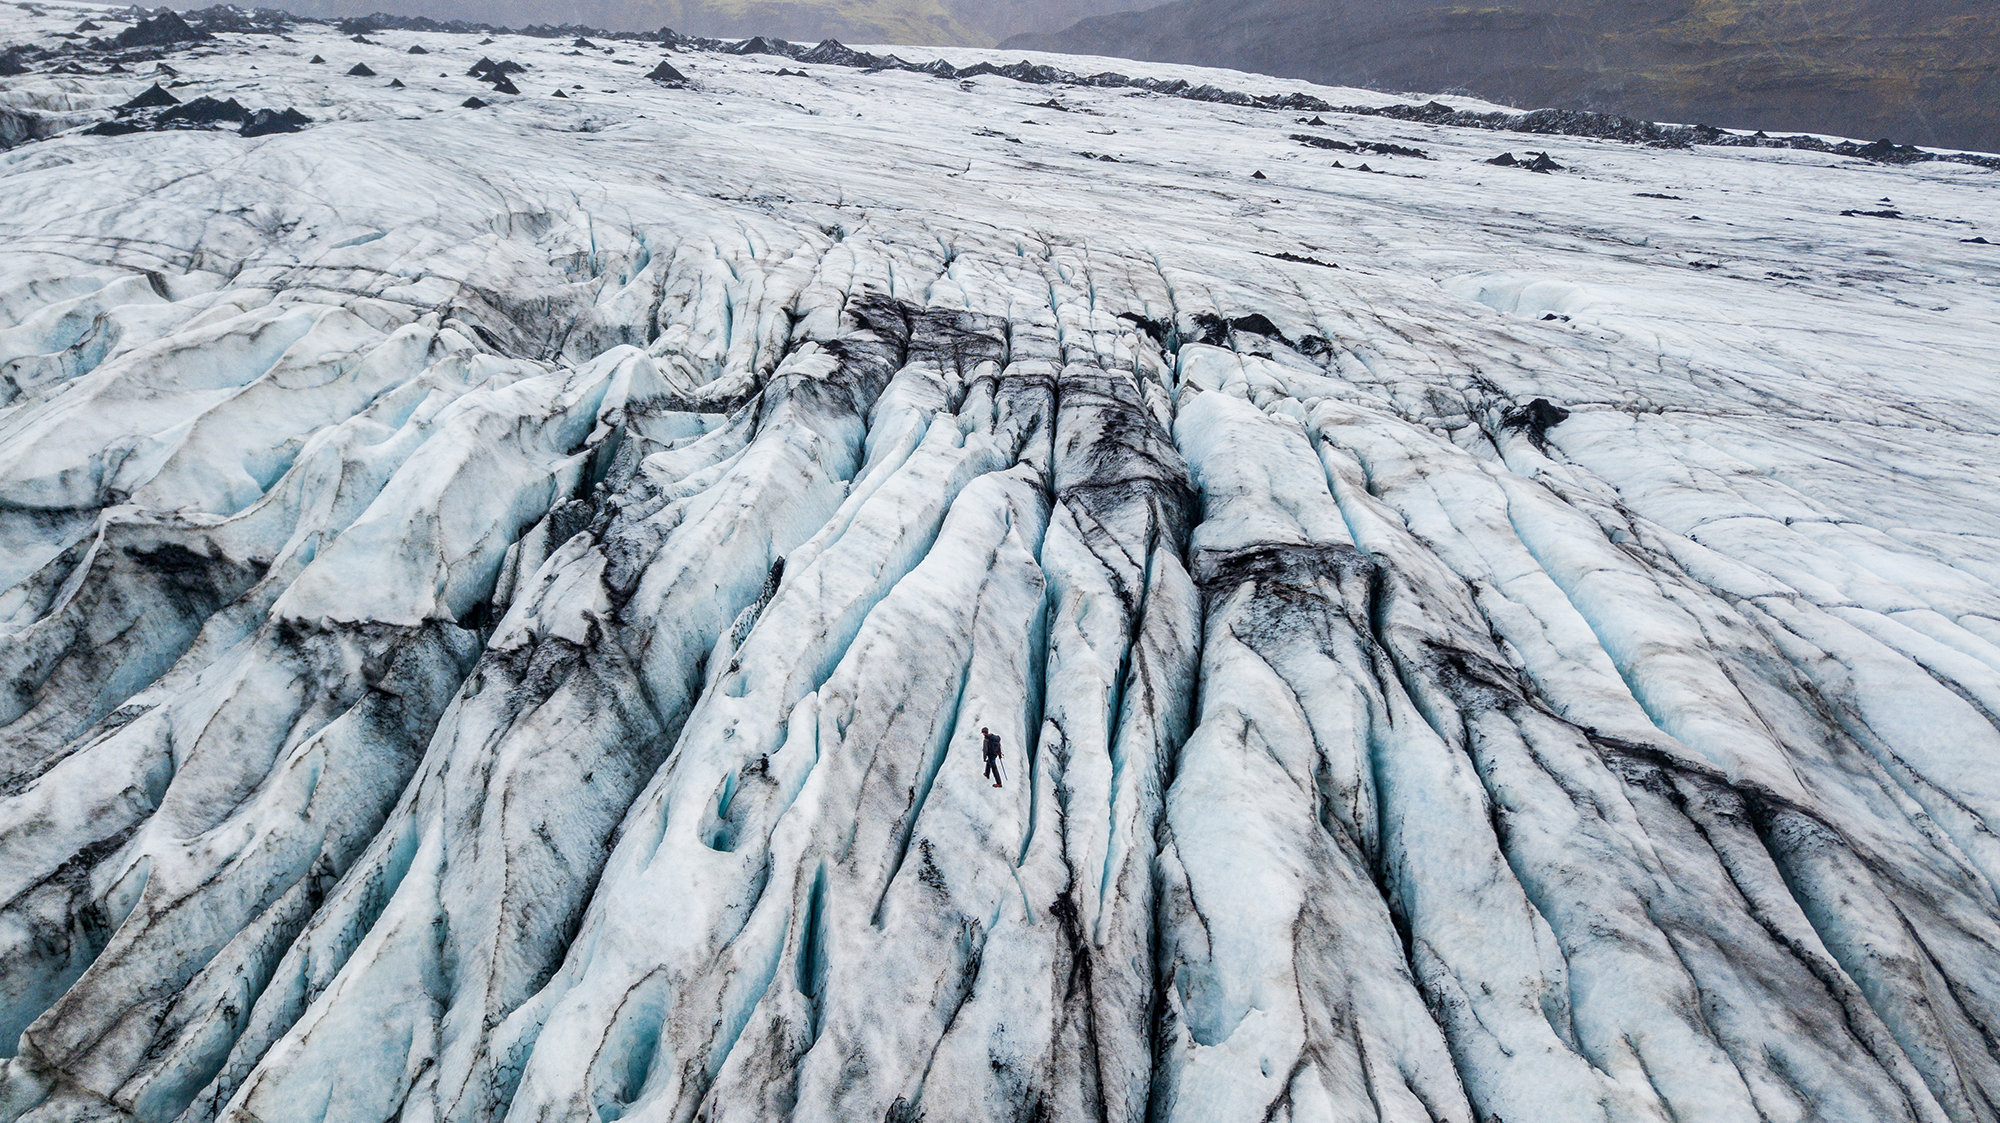 Sólheimajökull Glacier Hike | South Coast: Fire & Ice Tour | Hidden Iceland | Photo Danny Mcgee